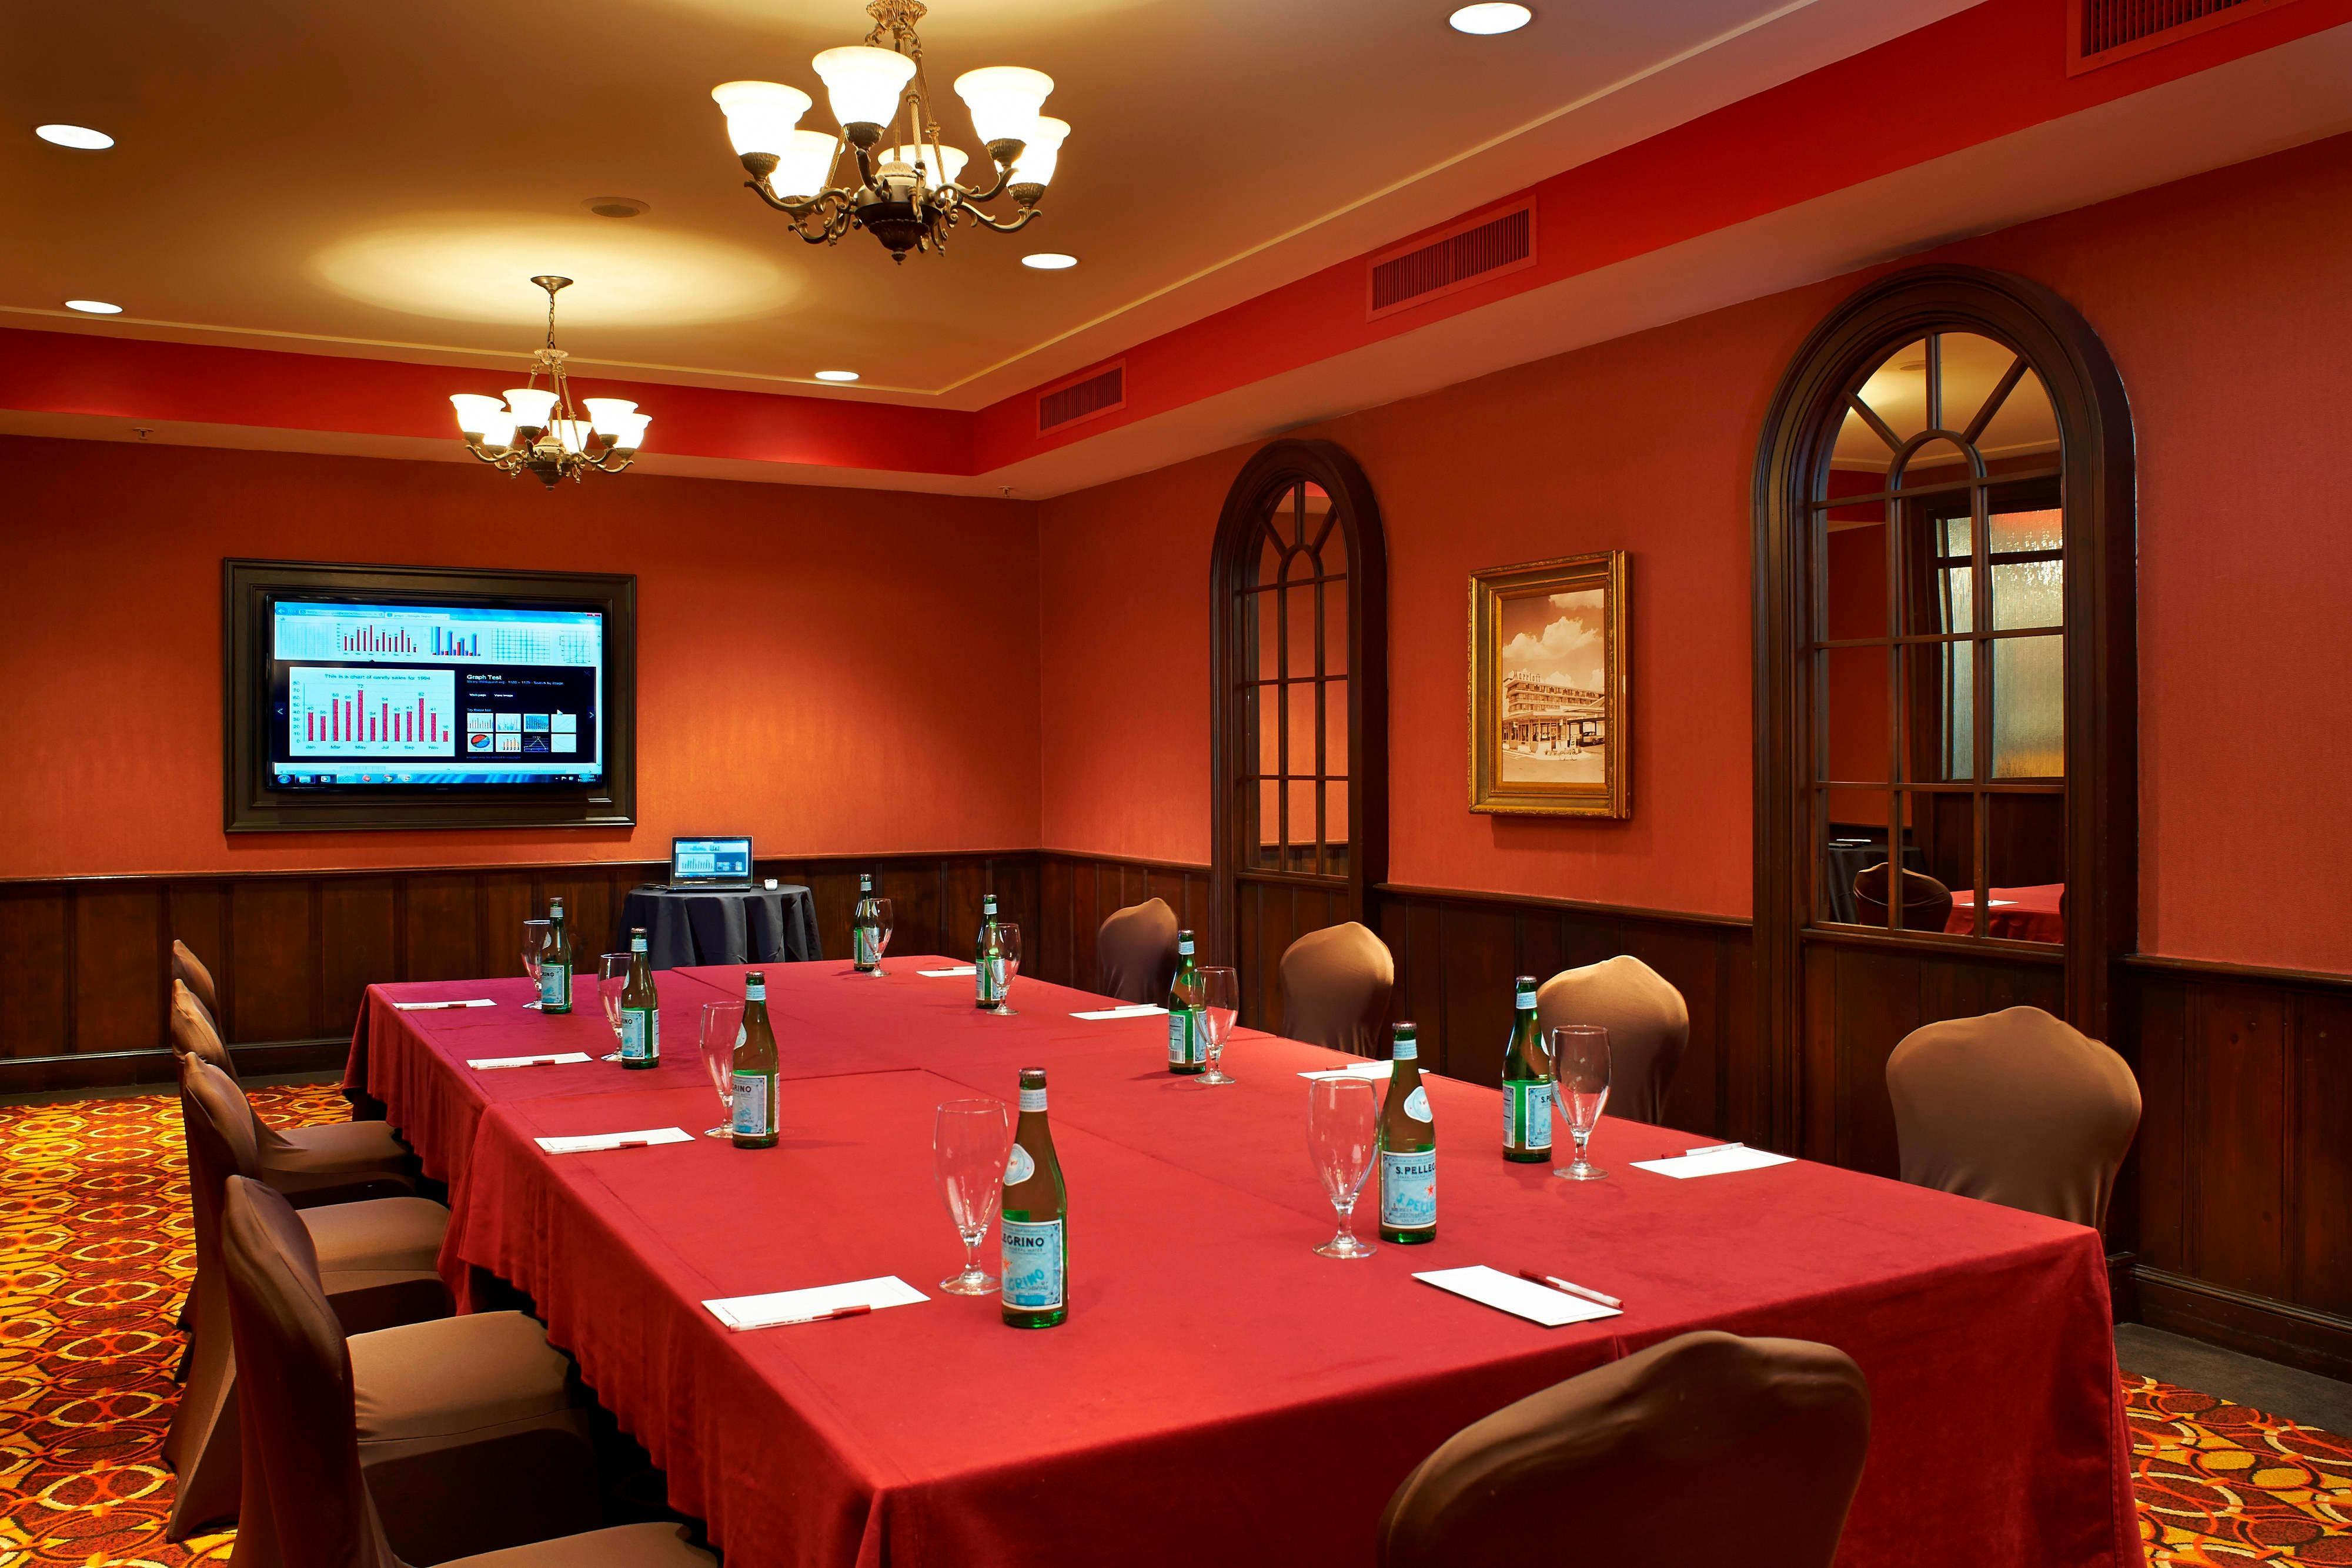 Meeting Venues in Dearborn